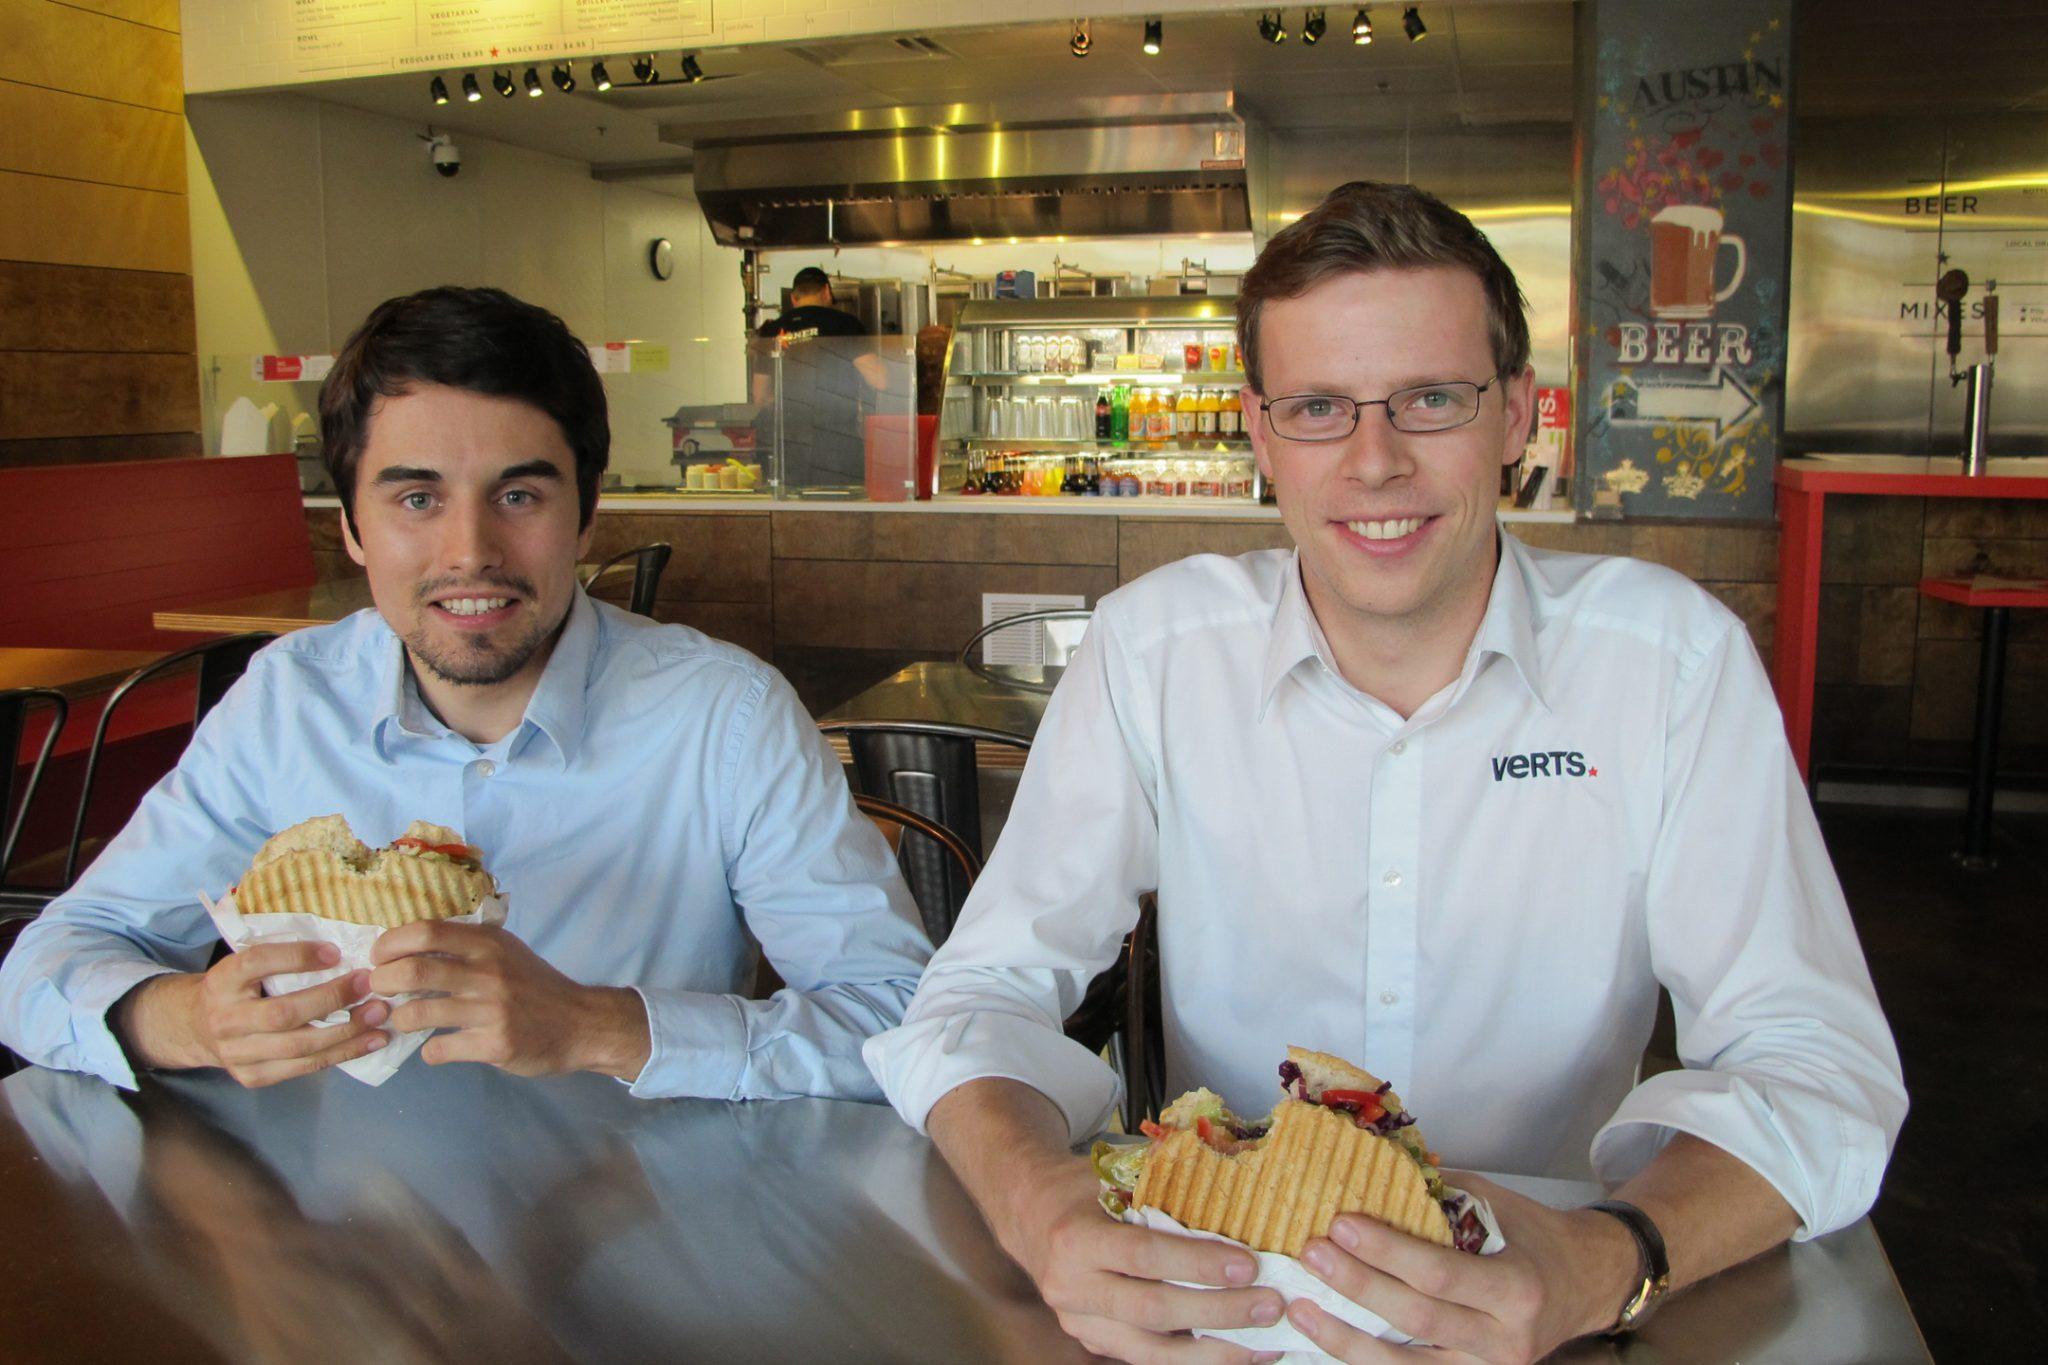 Photo: Verts founders Dominik Stein and Michael Heyne; Source: Courtesy Photo